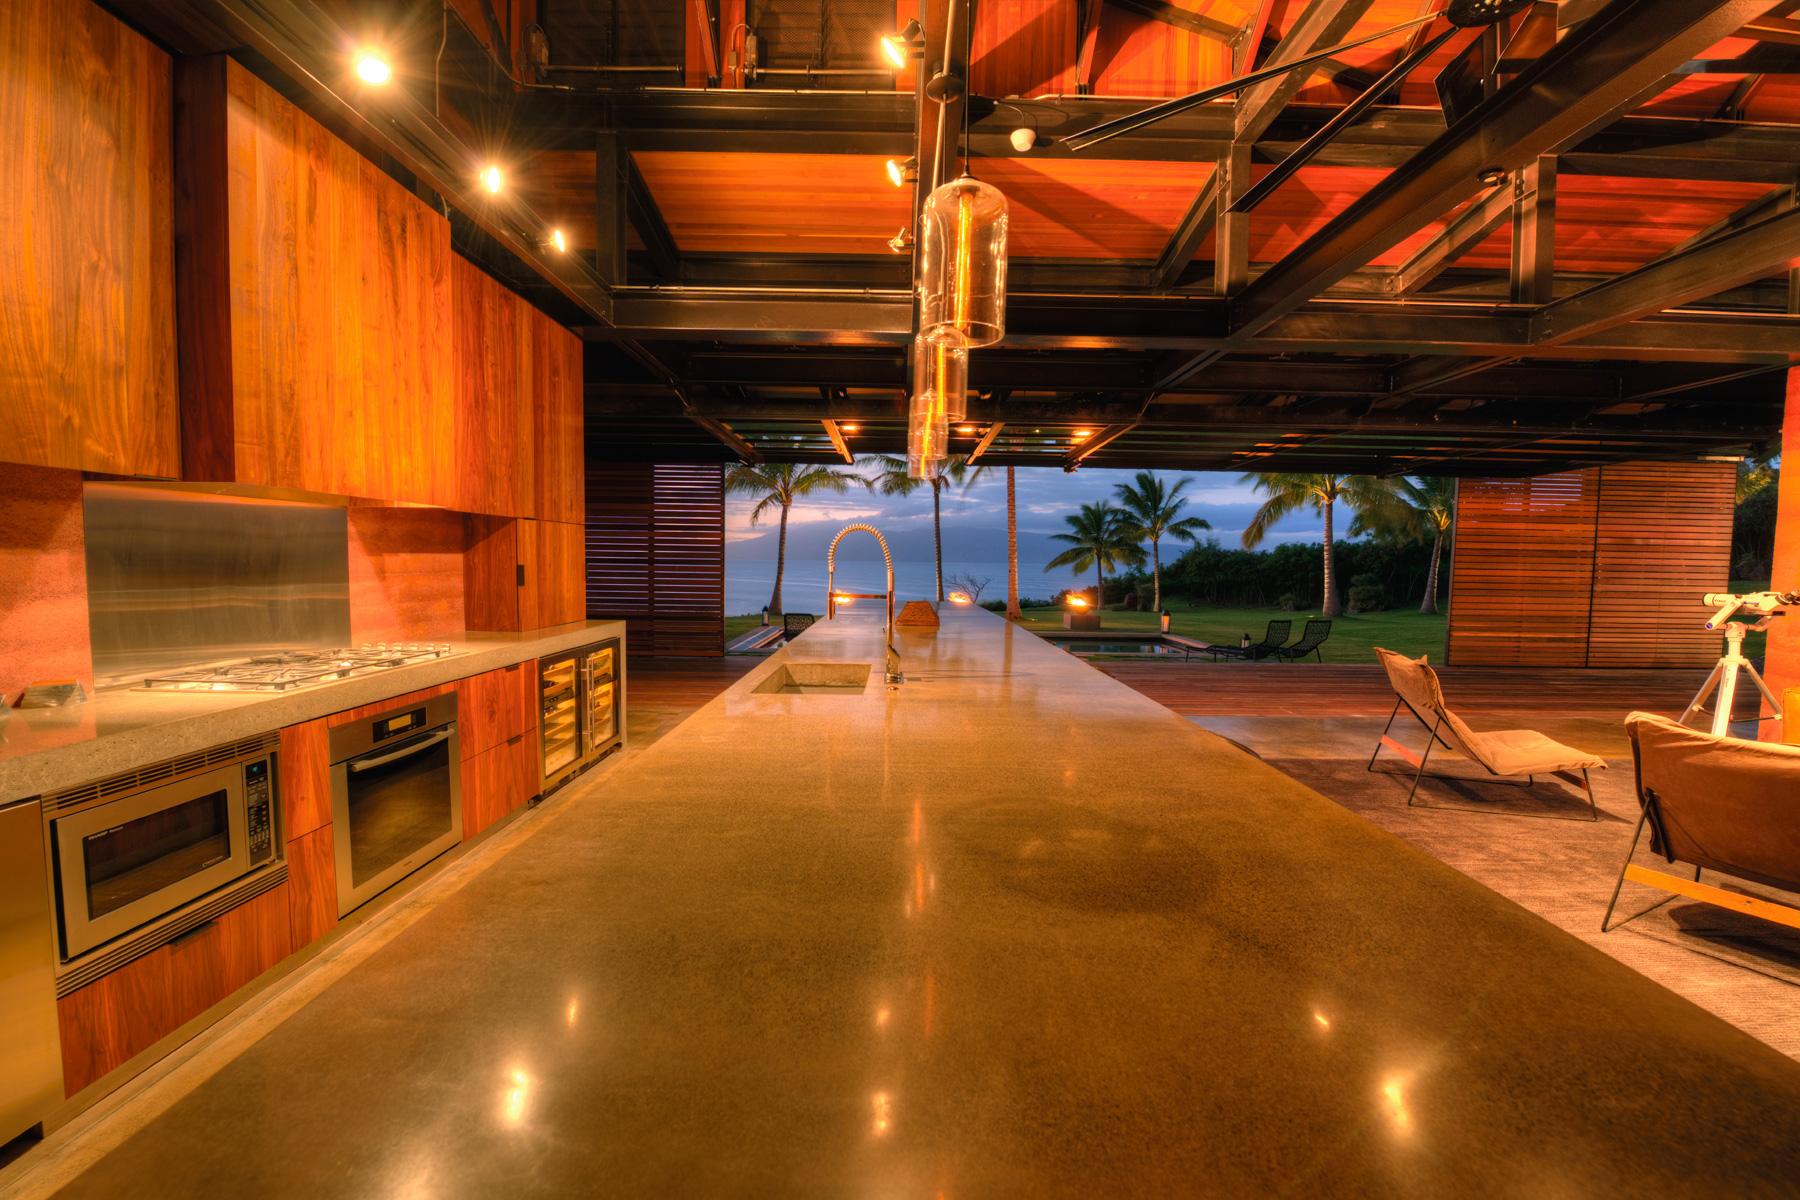 Honolua Bay Kapalua House for Sale Peter Lik Kitchen